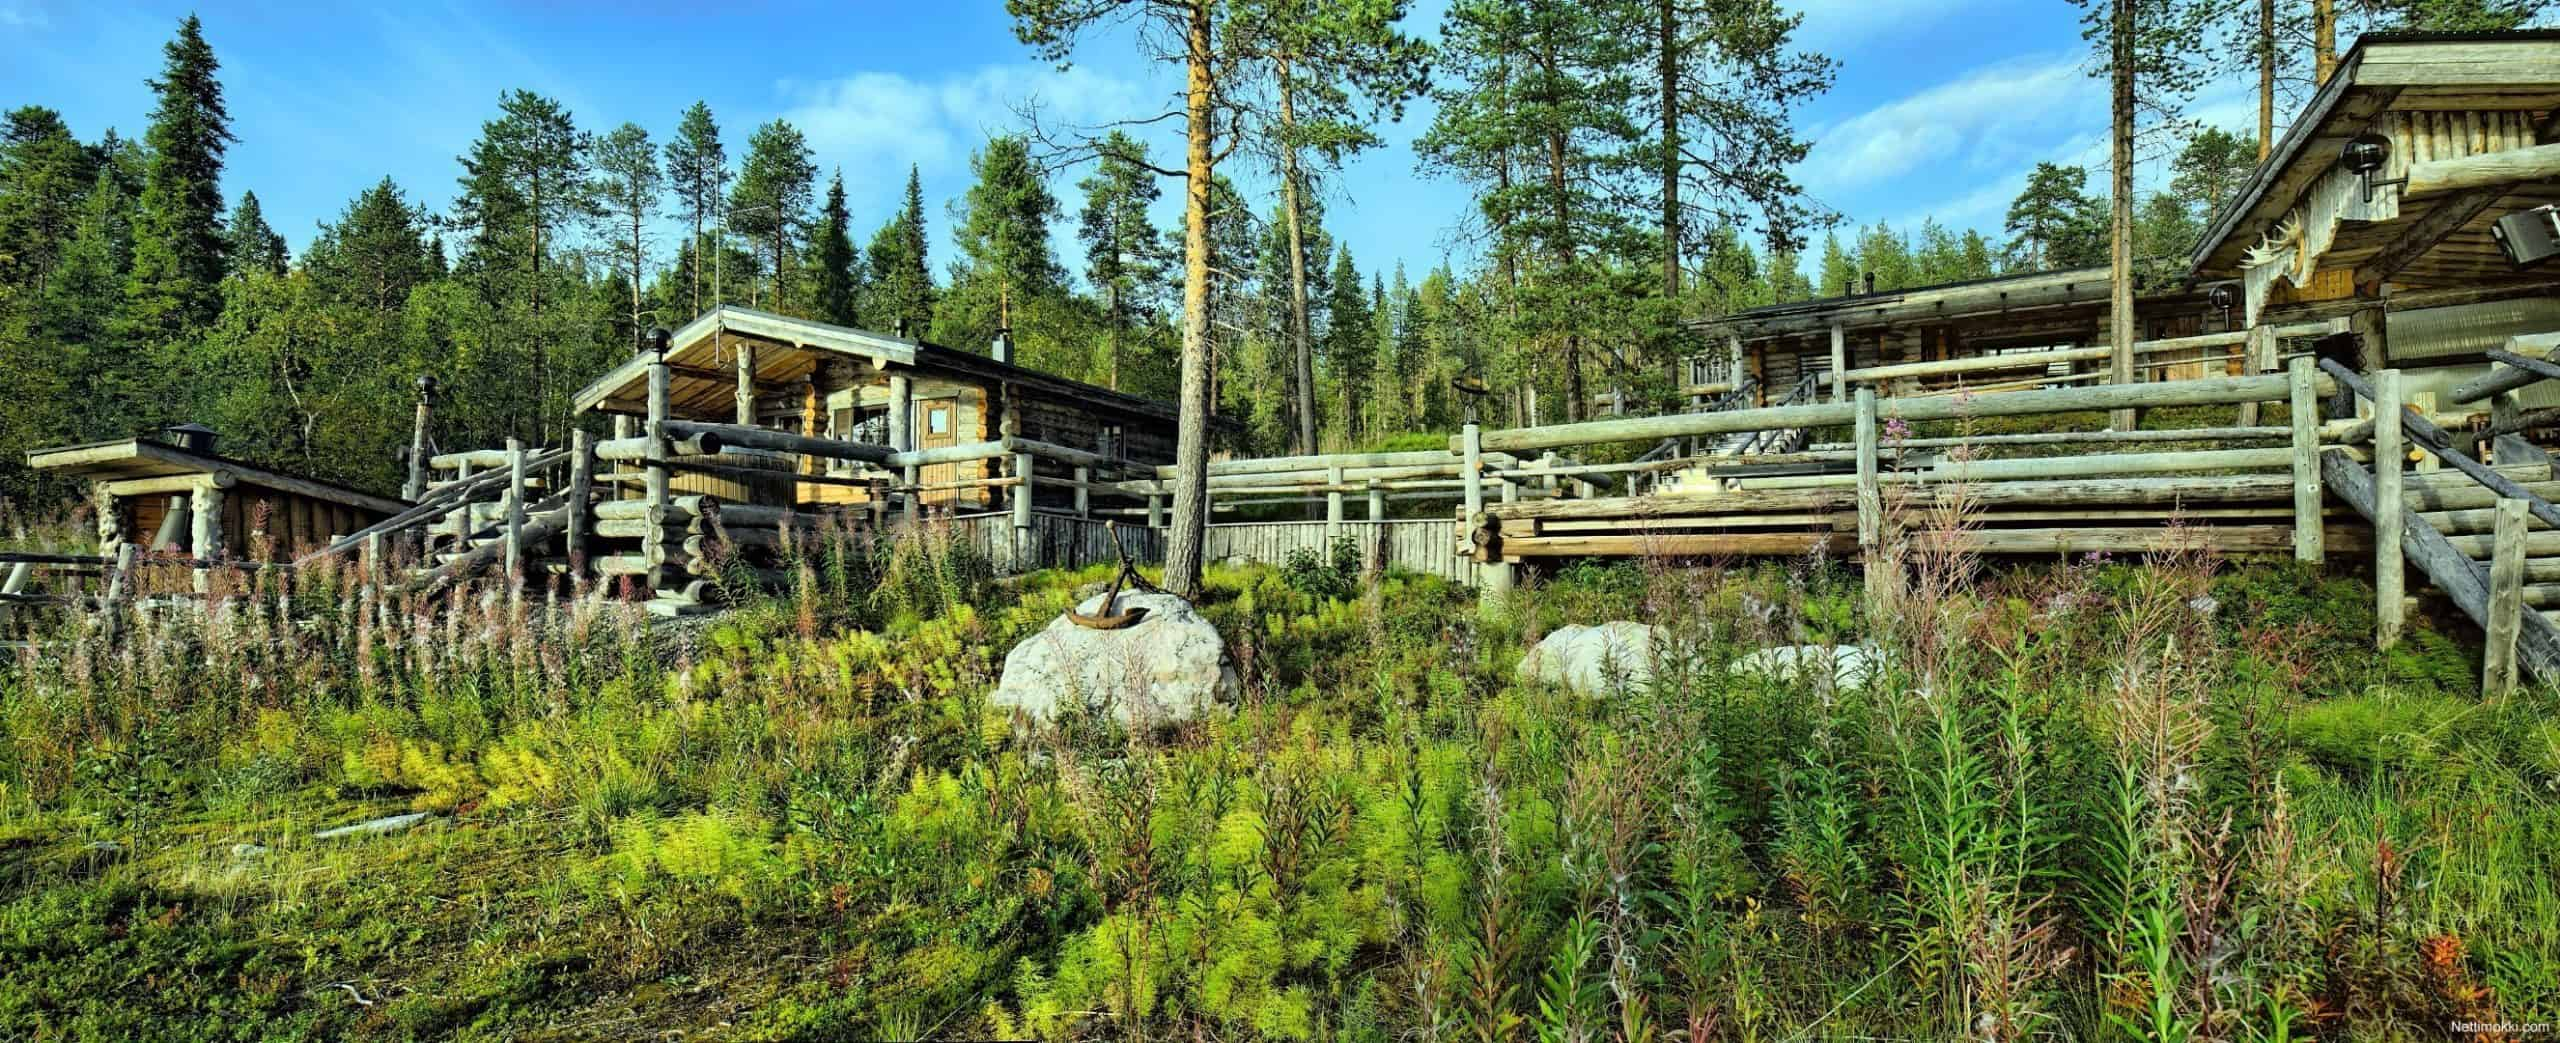 Lappland Snowkite-Camp 29.01.-09.02. 2022 9